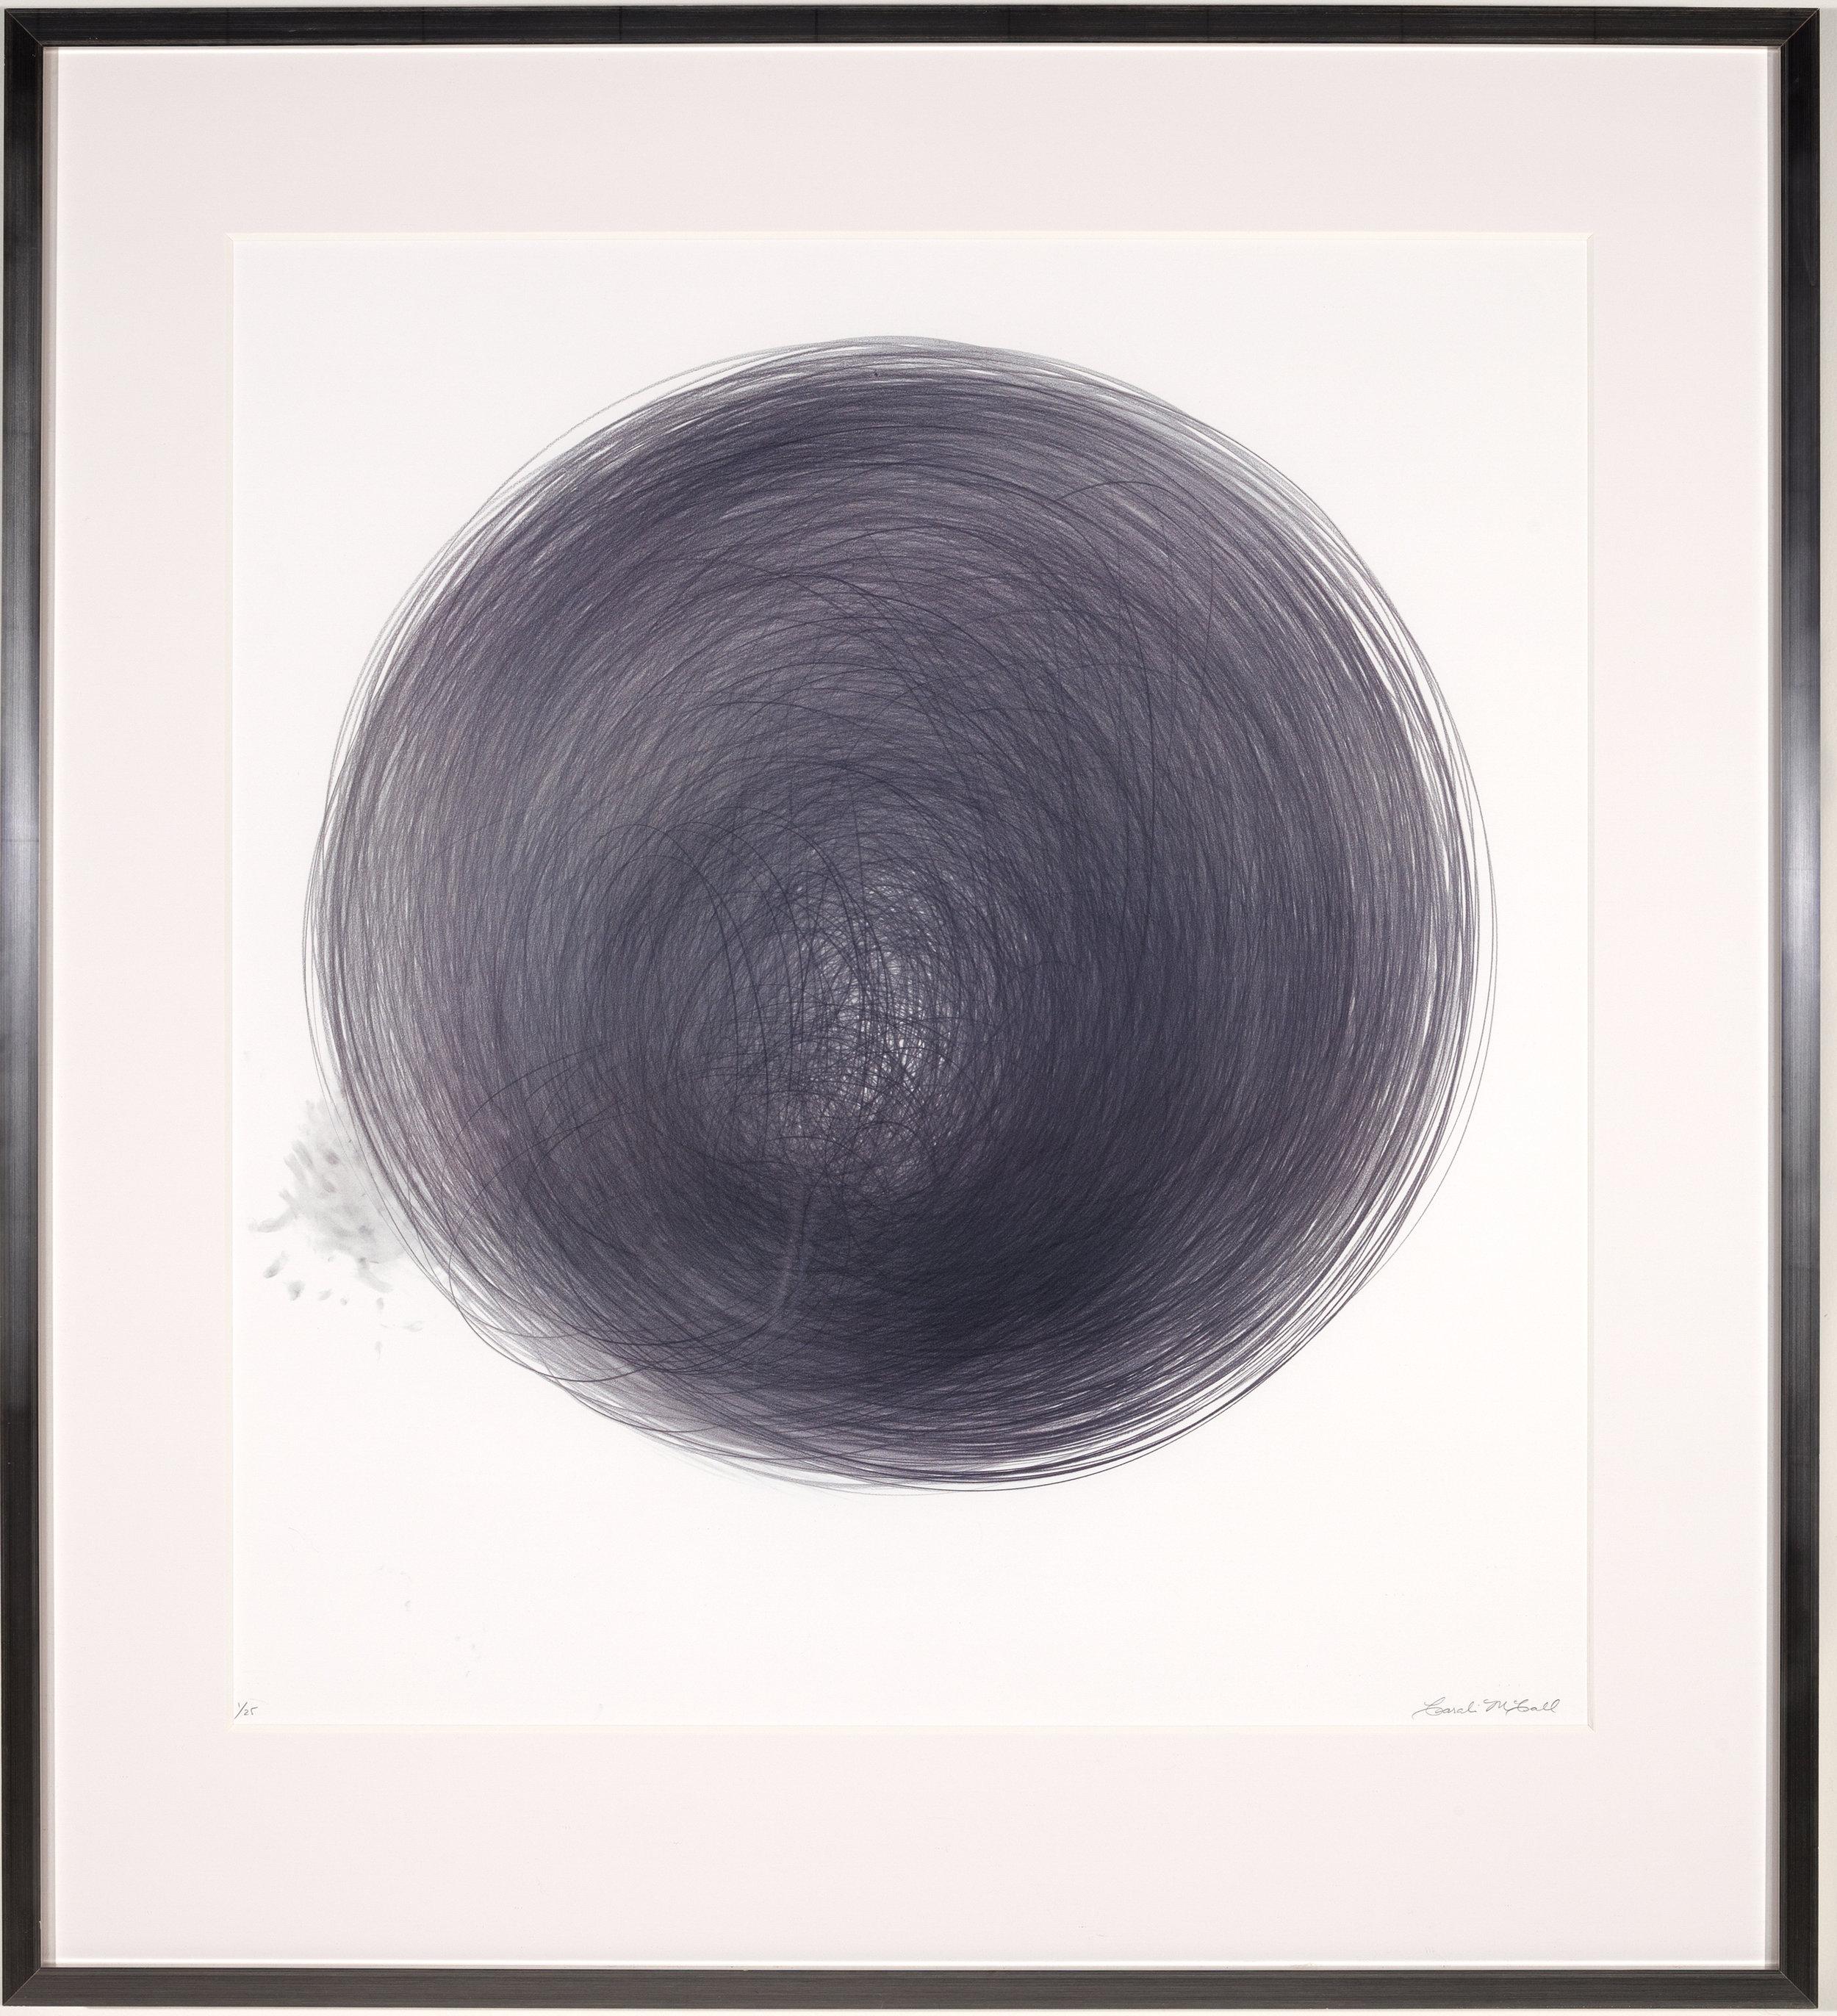 Work no. 1 (Circle Drawing) 1hr 09min (2017)